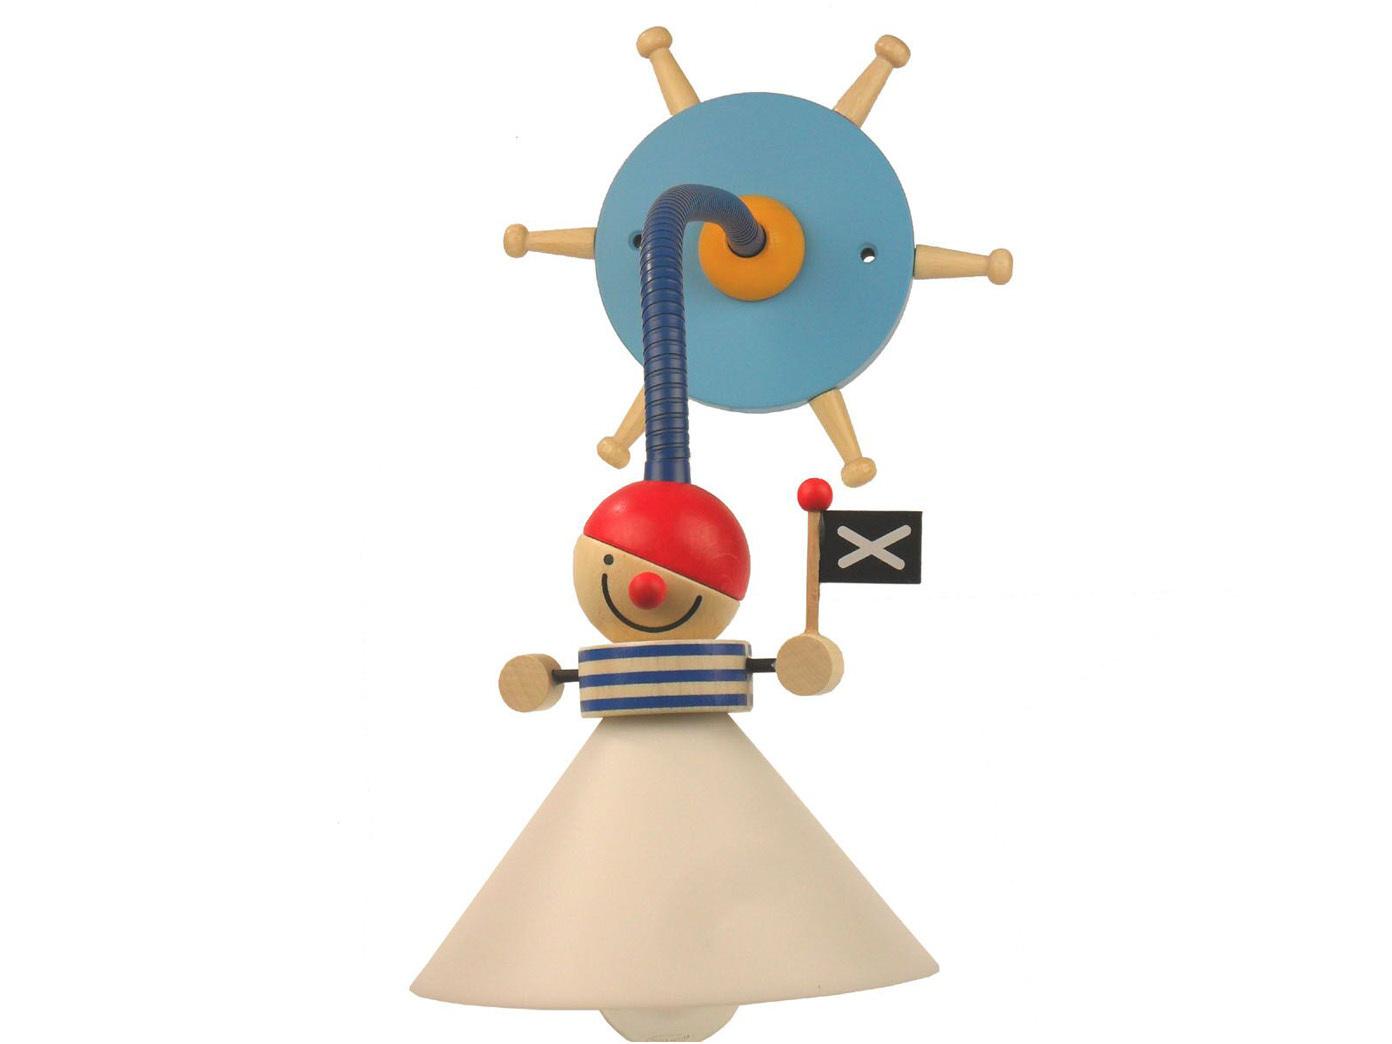 wandlampe kinderzimmer jungen pirat kinderlampe 30cm flexrohr sehr biegsam neu ebay. Black Bedroom Furniture Sets. Home Design Ideas